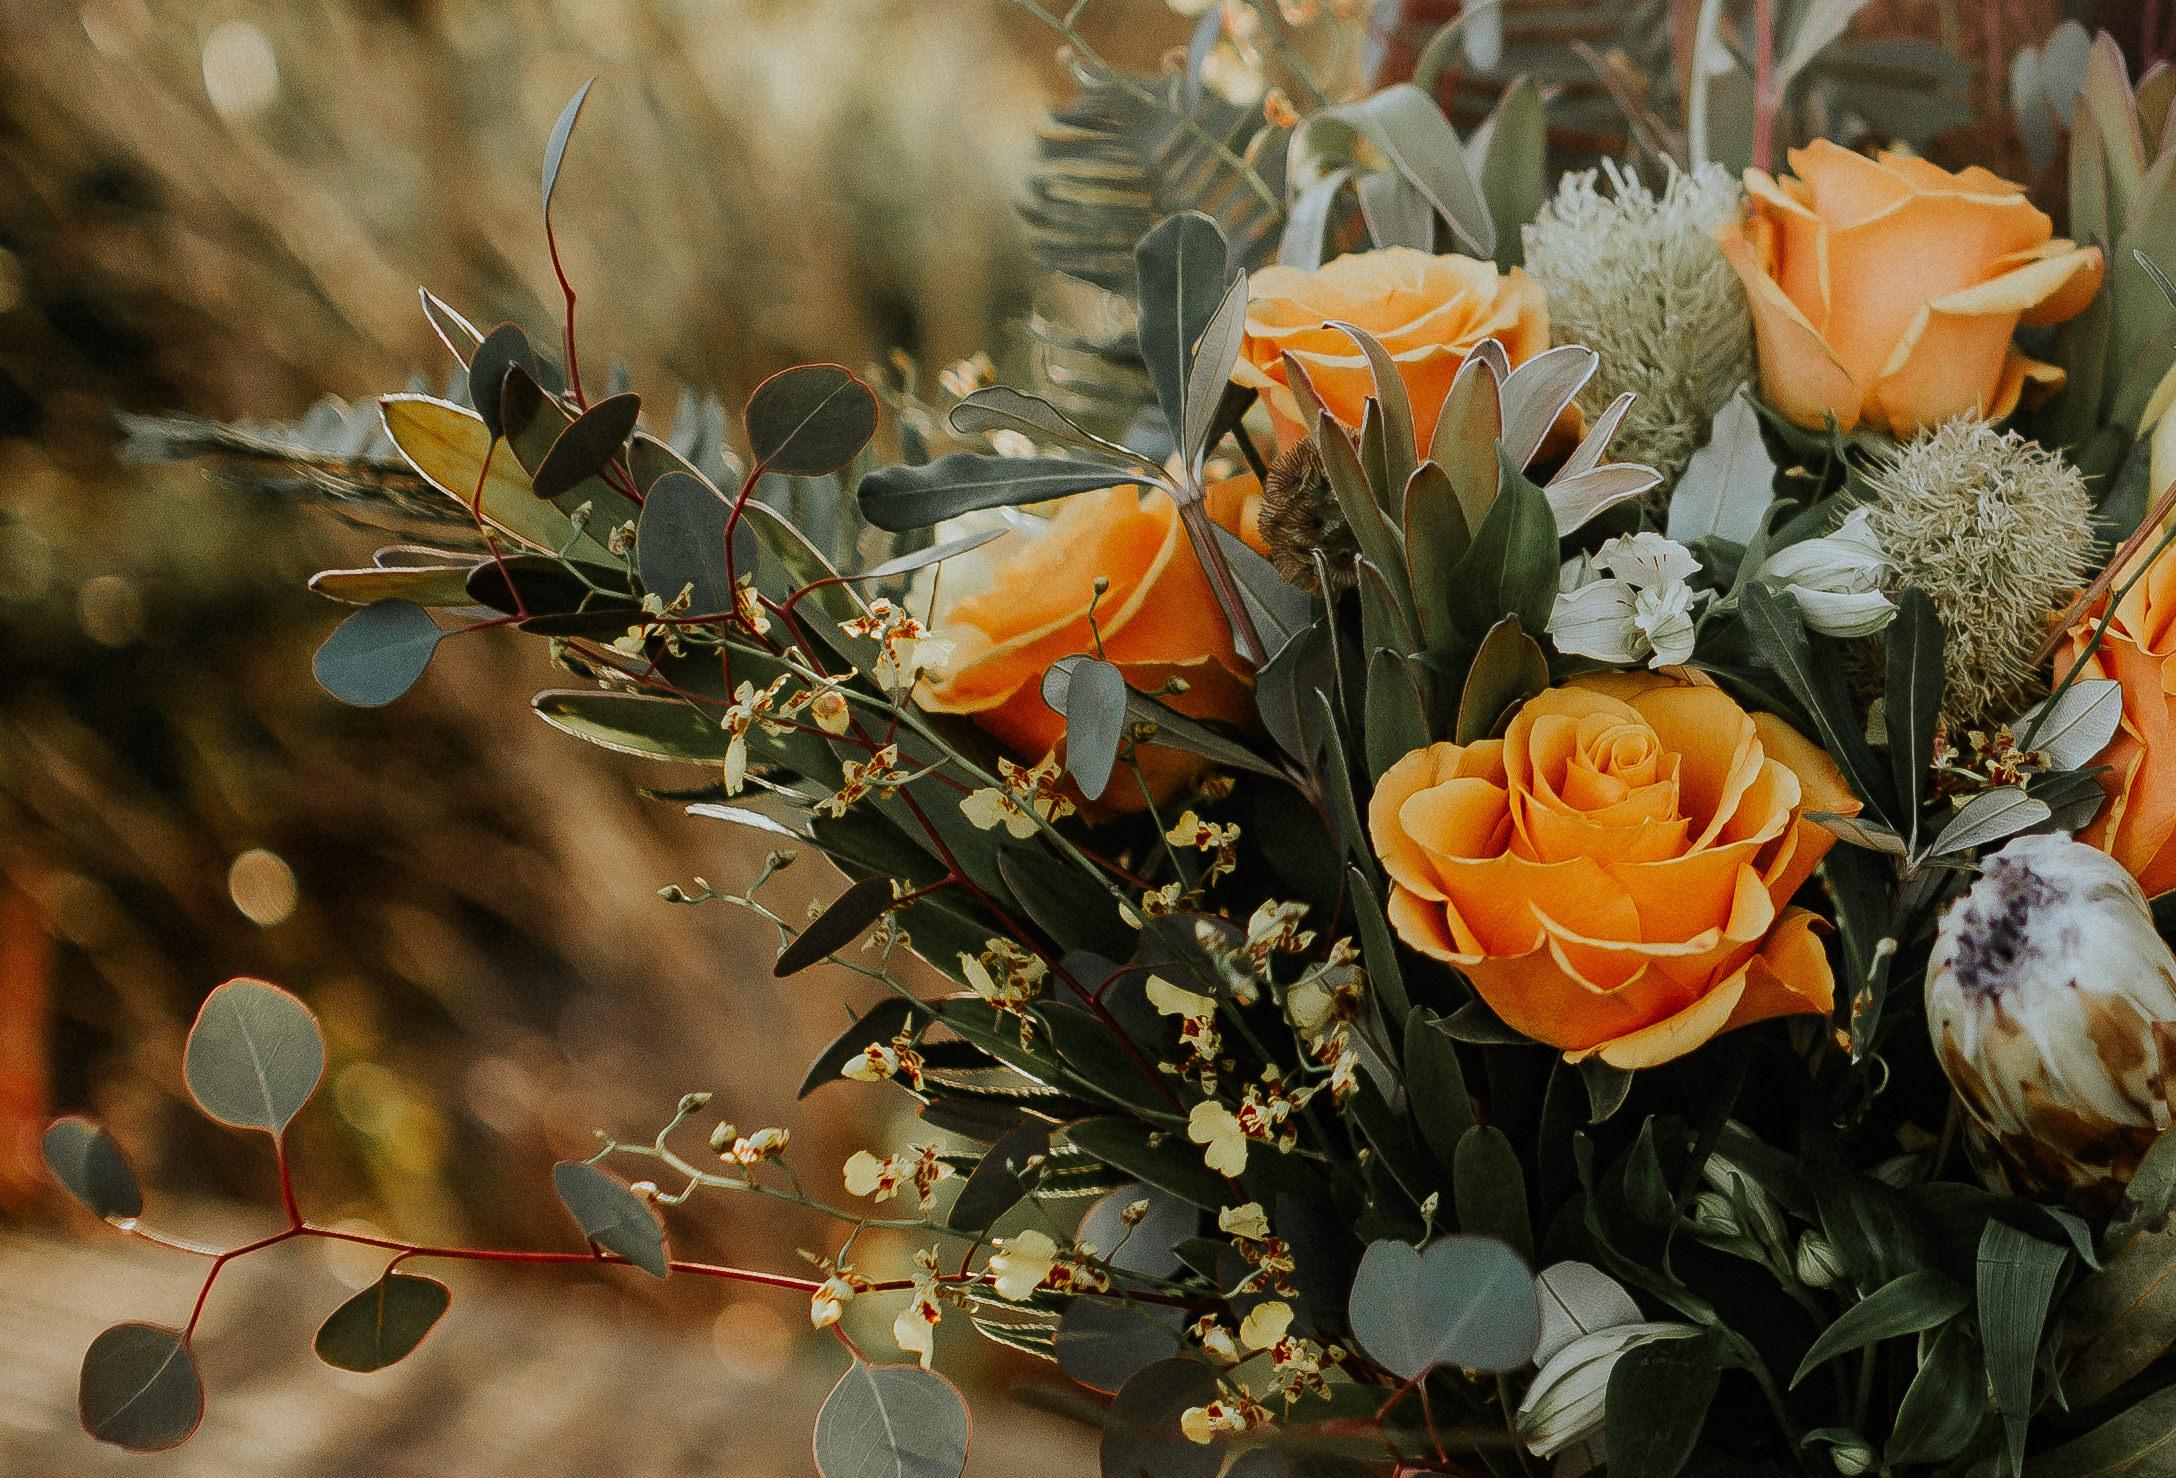 Cascara-PaulineHoldenPhotography-8090-2.jpg